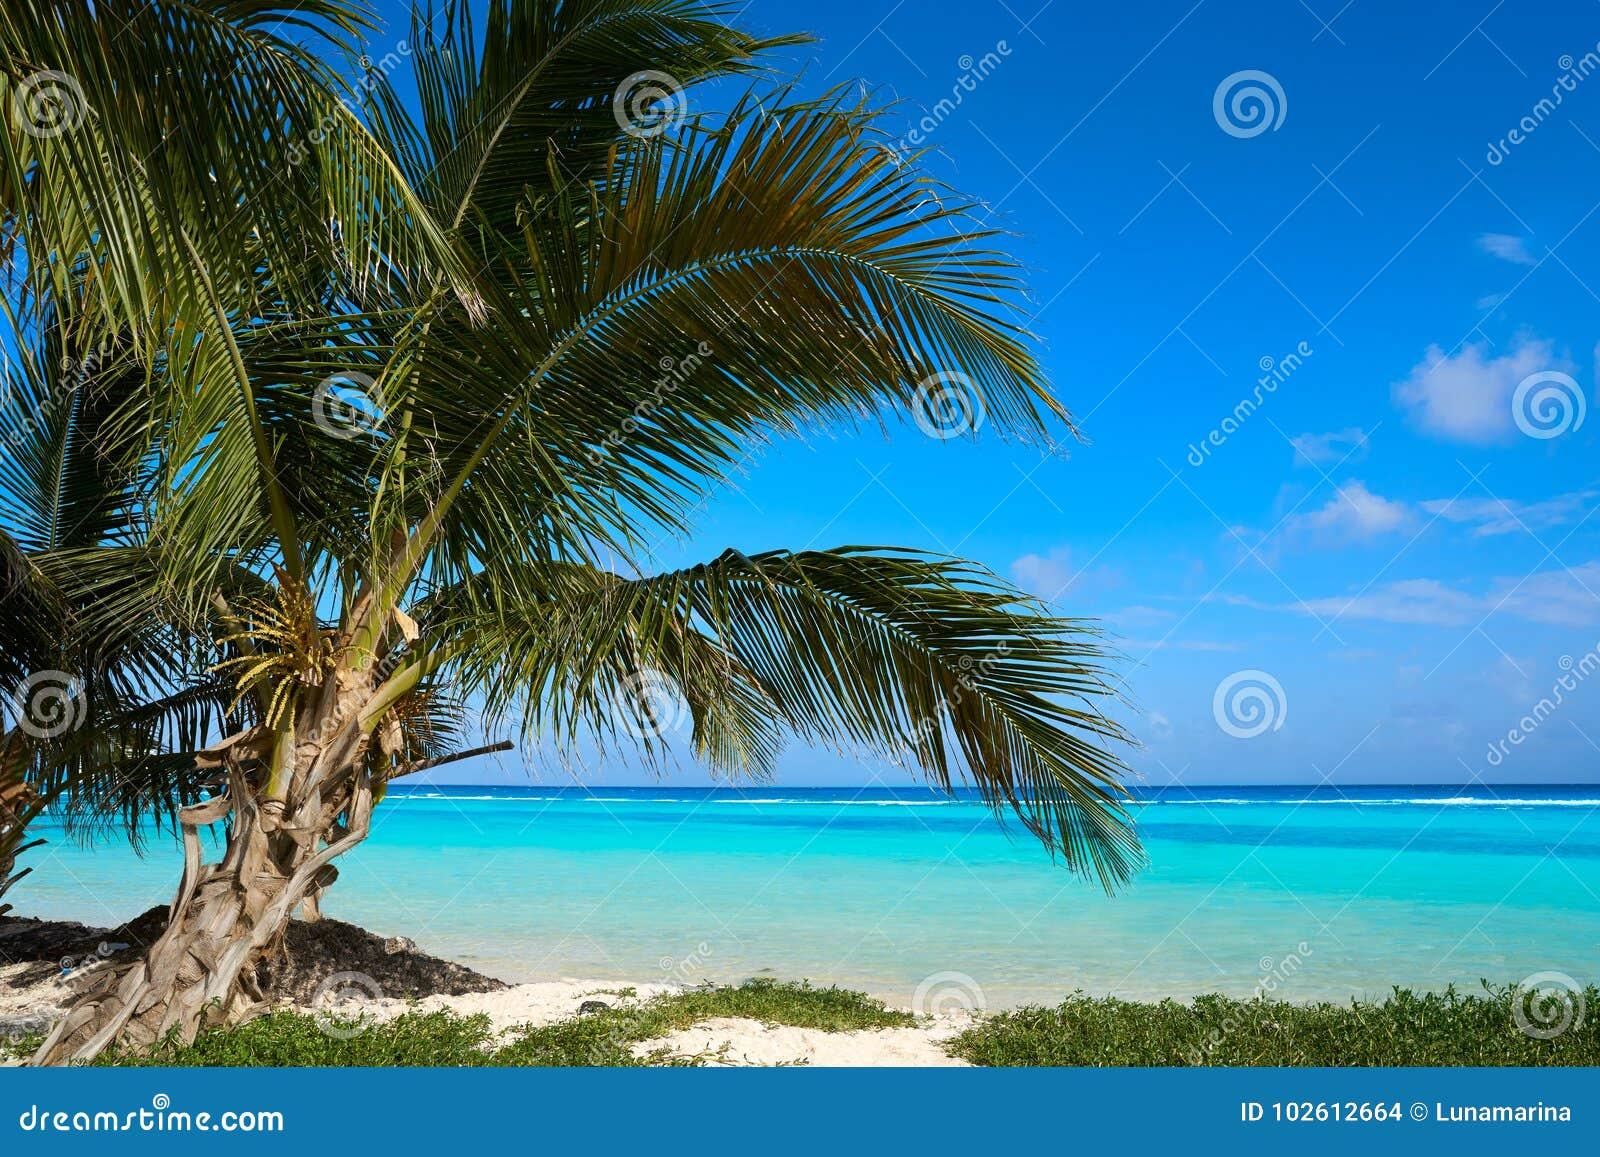 Mahahual Caribbean Beach In Costa Maya Stock Photo Image Of American Shore 102612664